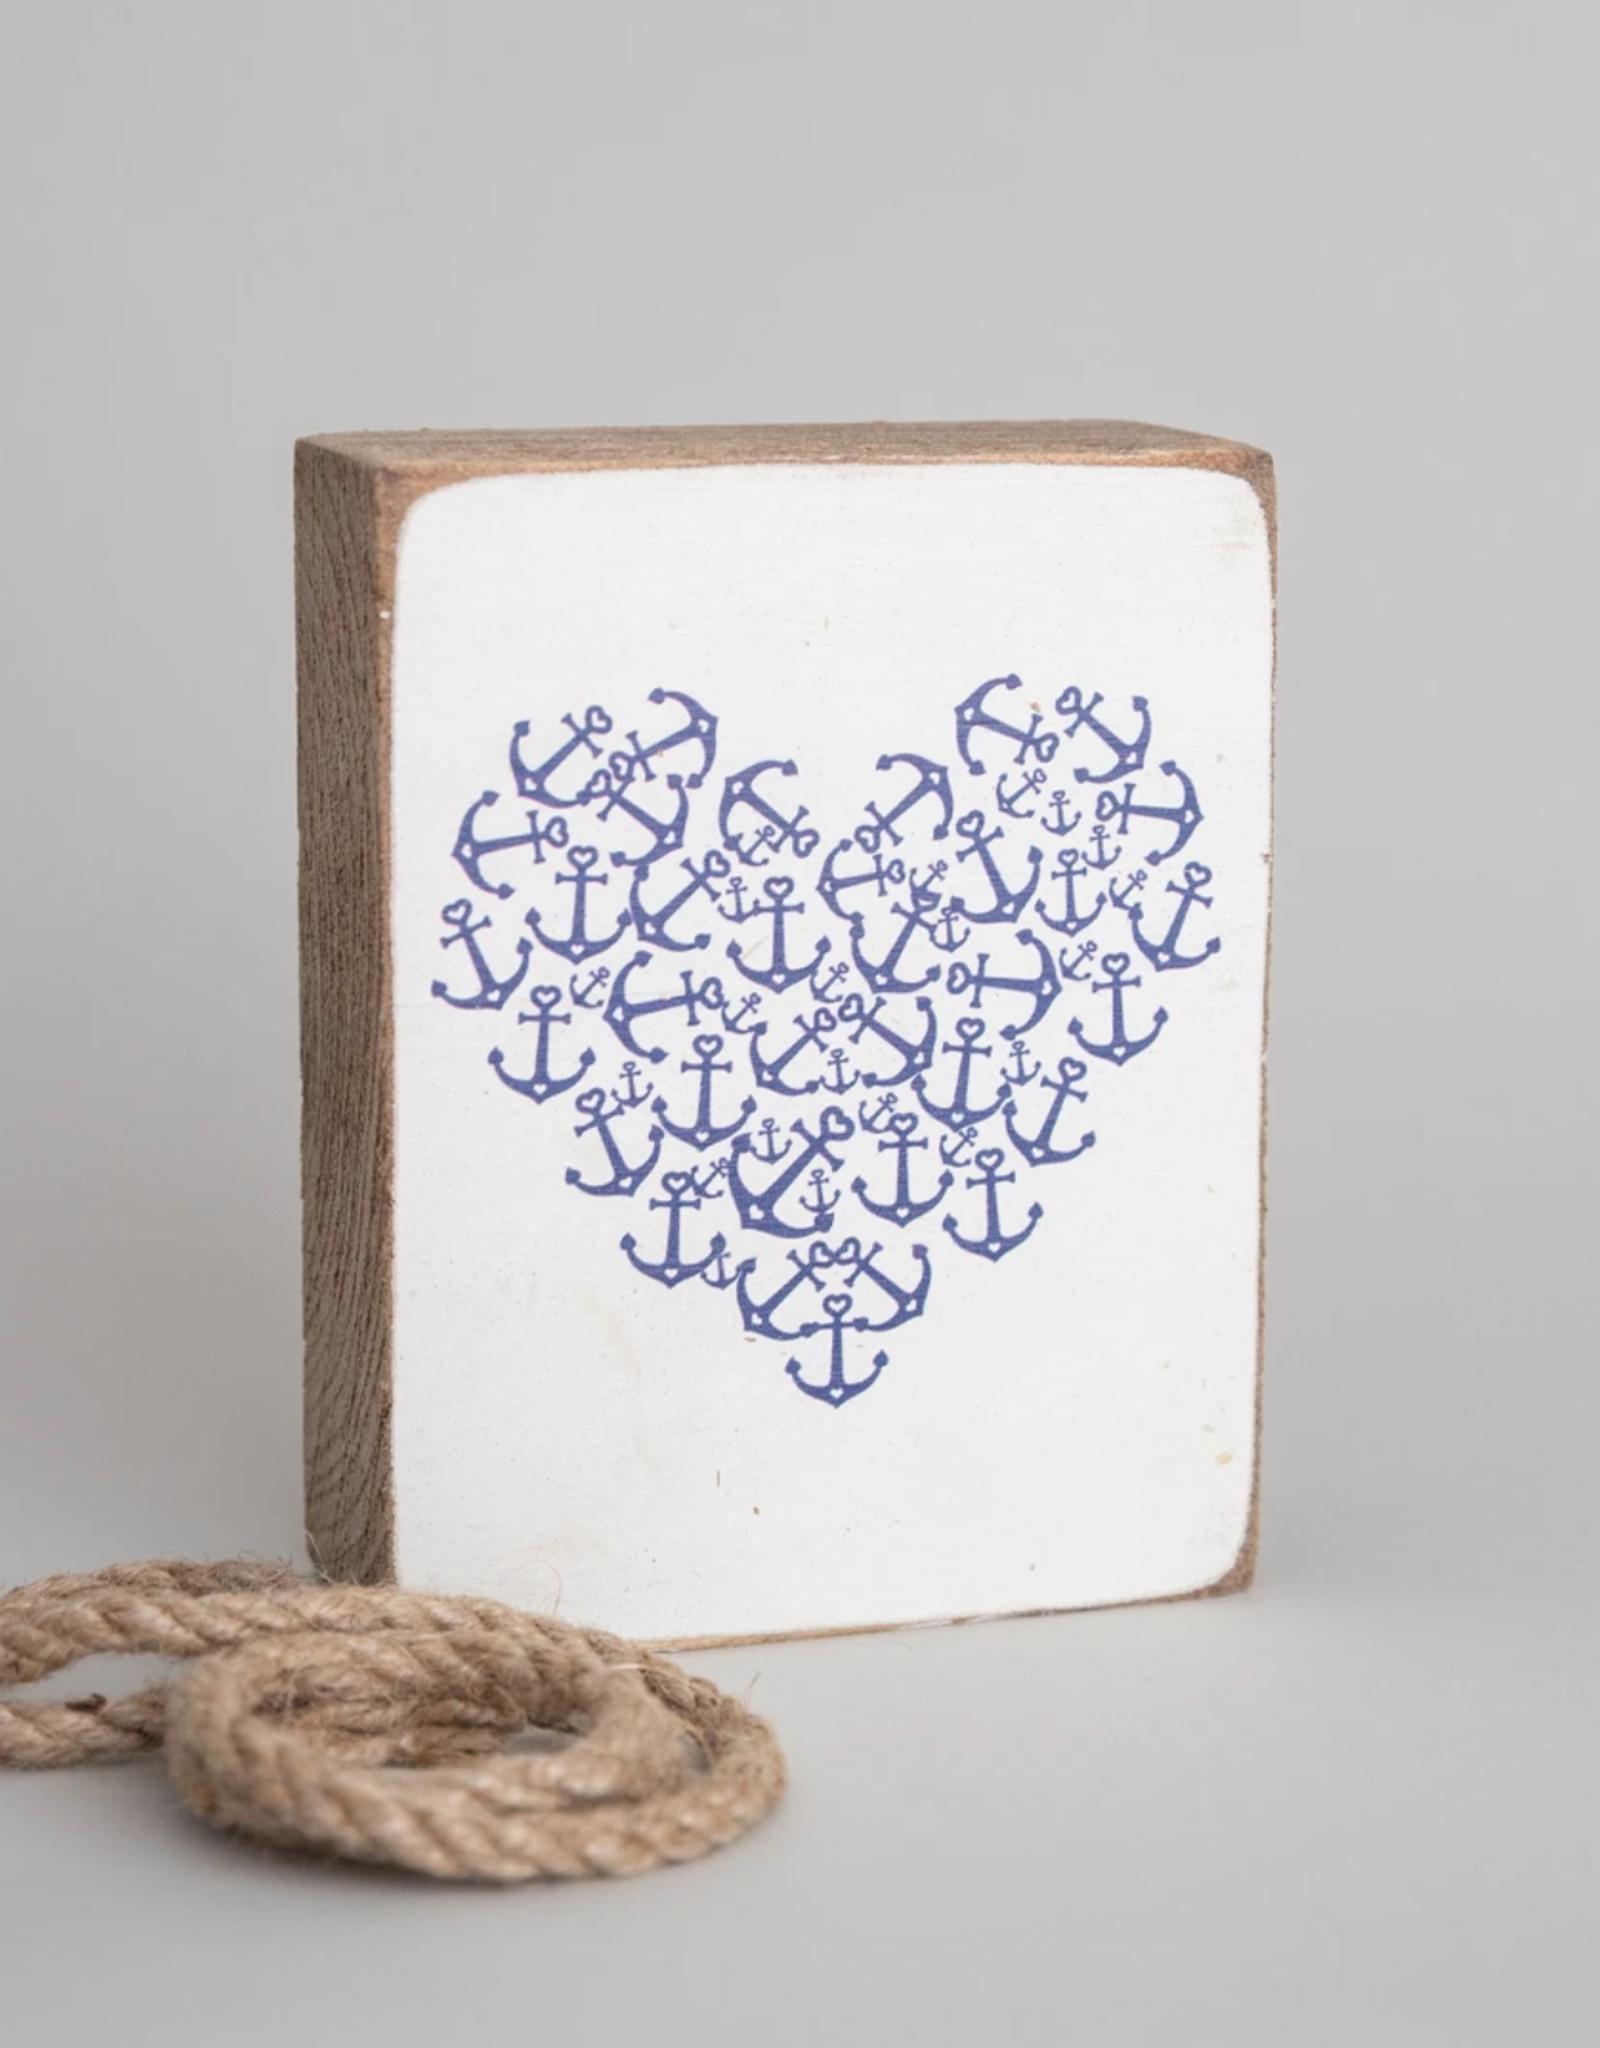 Rustic Marlin Rustic Marlin - Anchor Heart Symbol Block